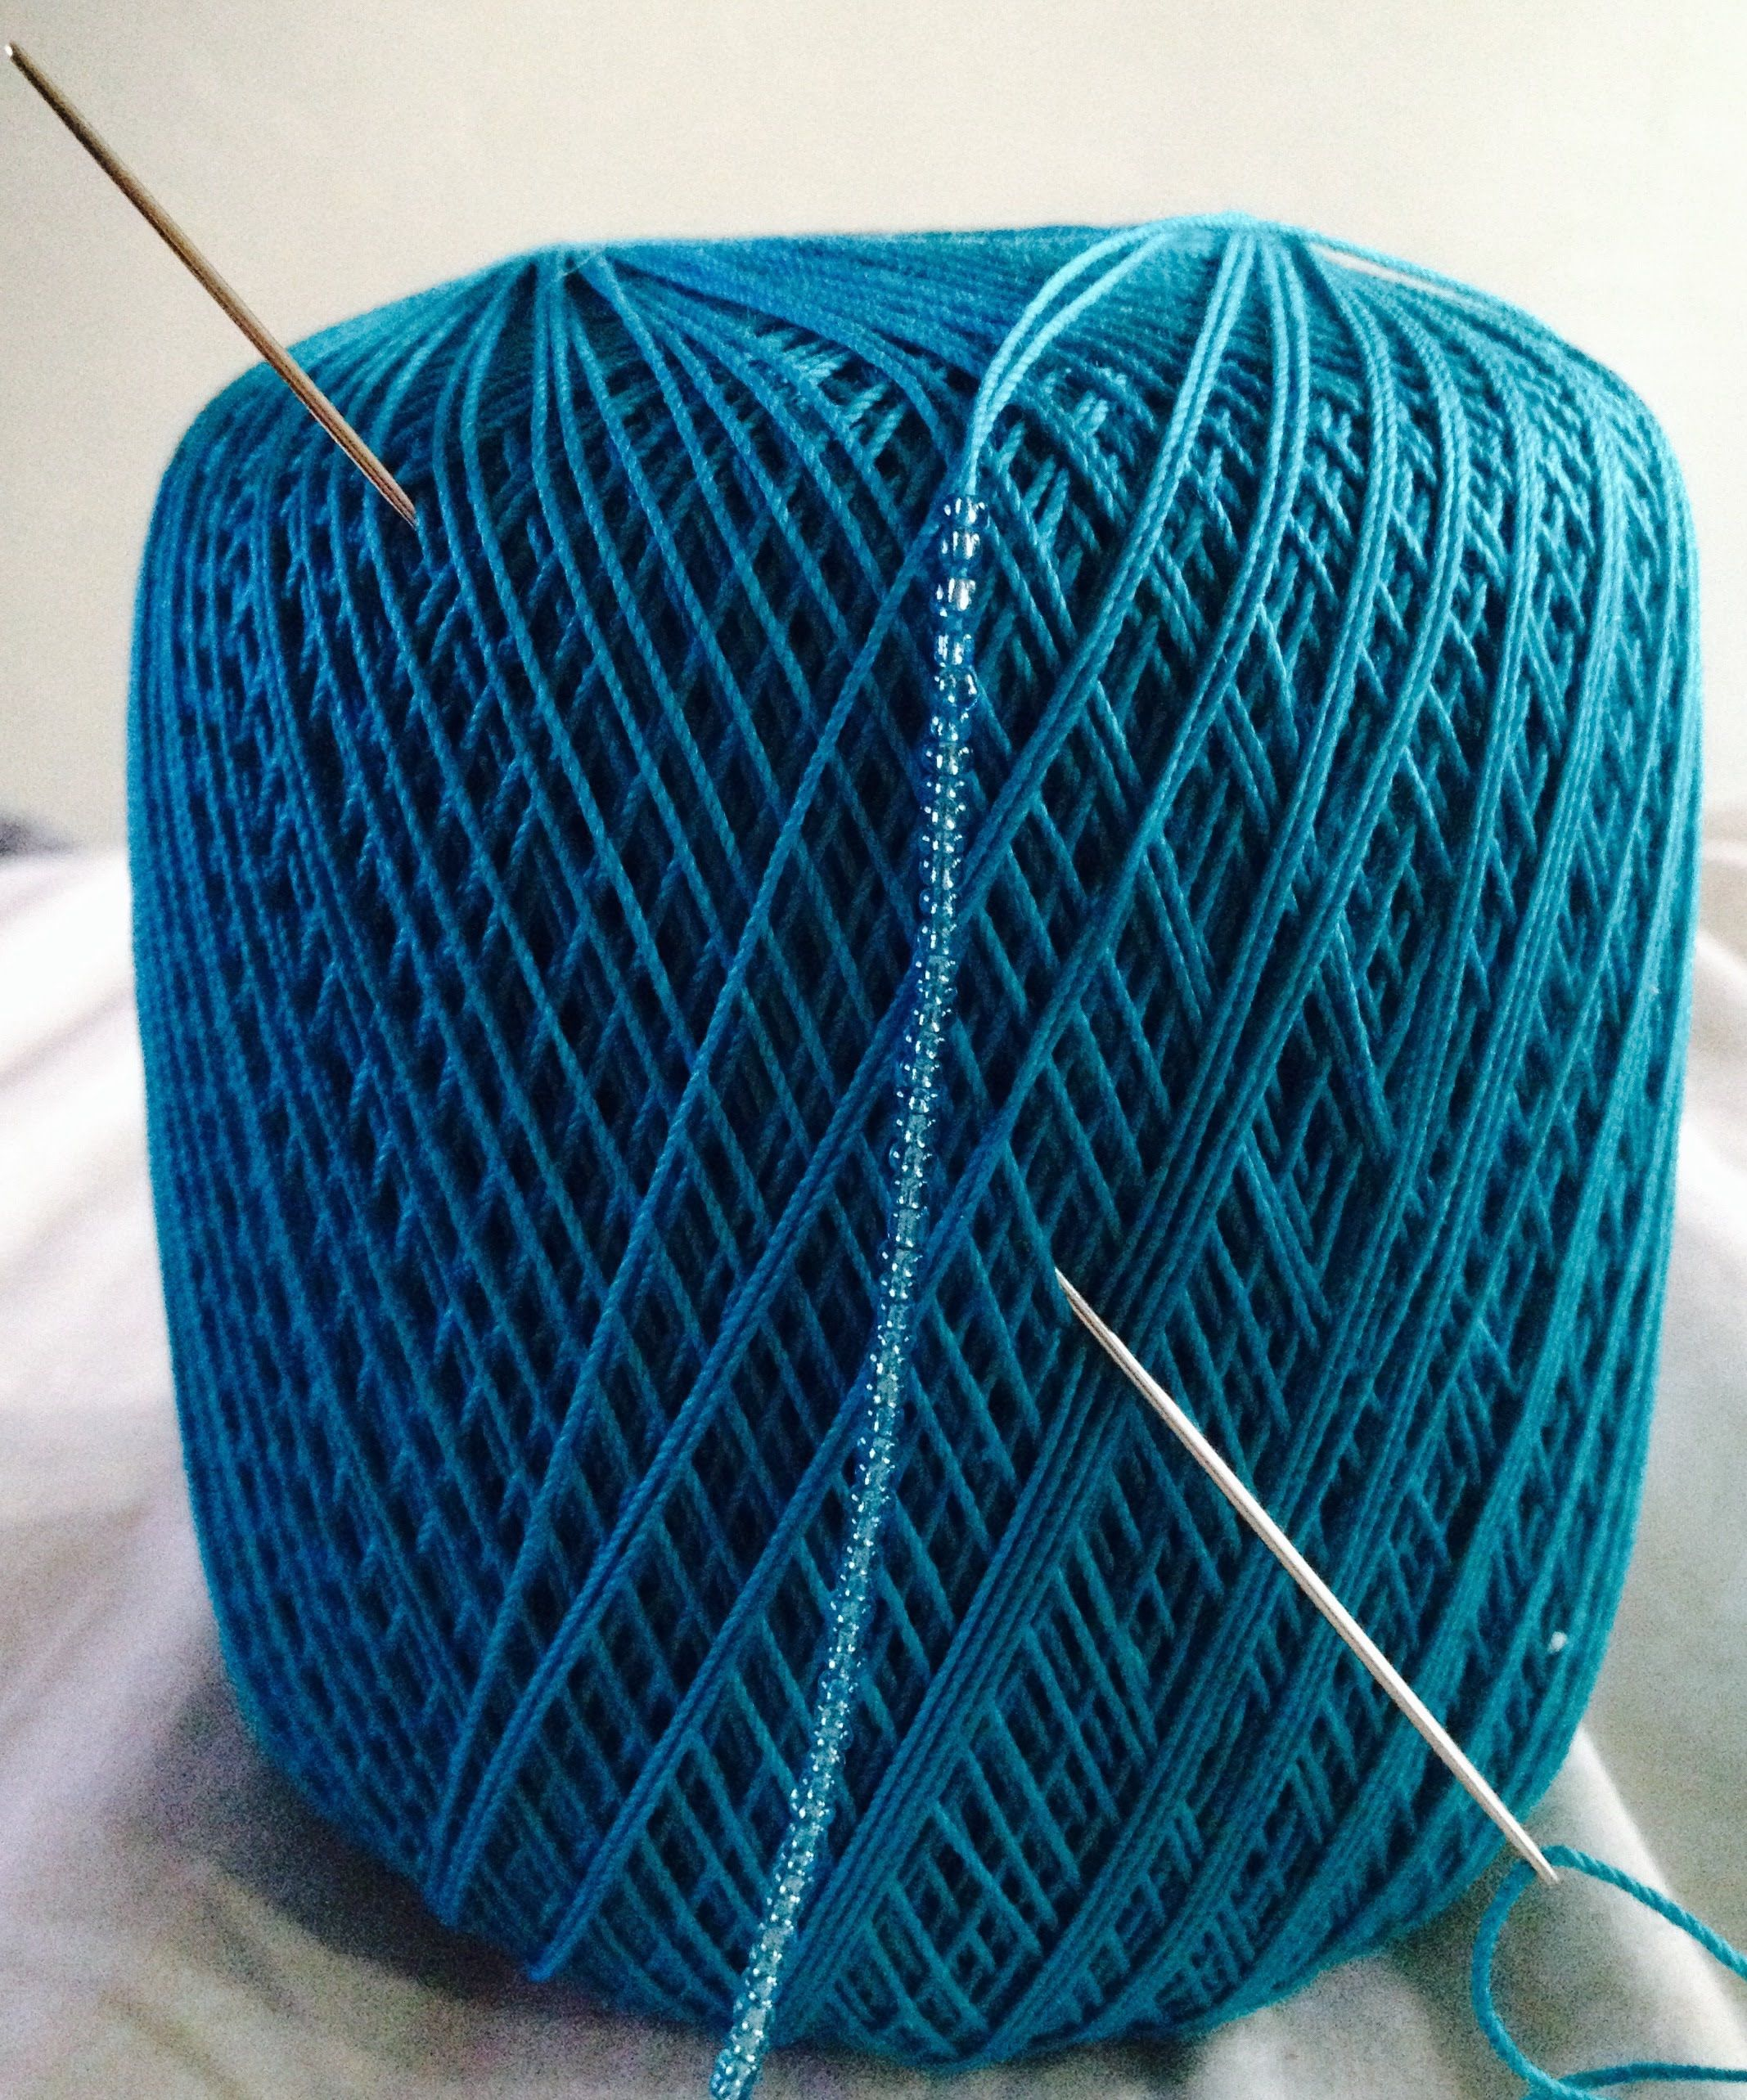 Needle Tatting For Beginners | Handwork: crochet, knit, sew, etc ...